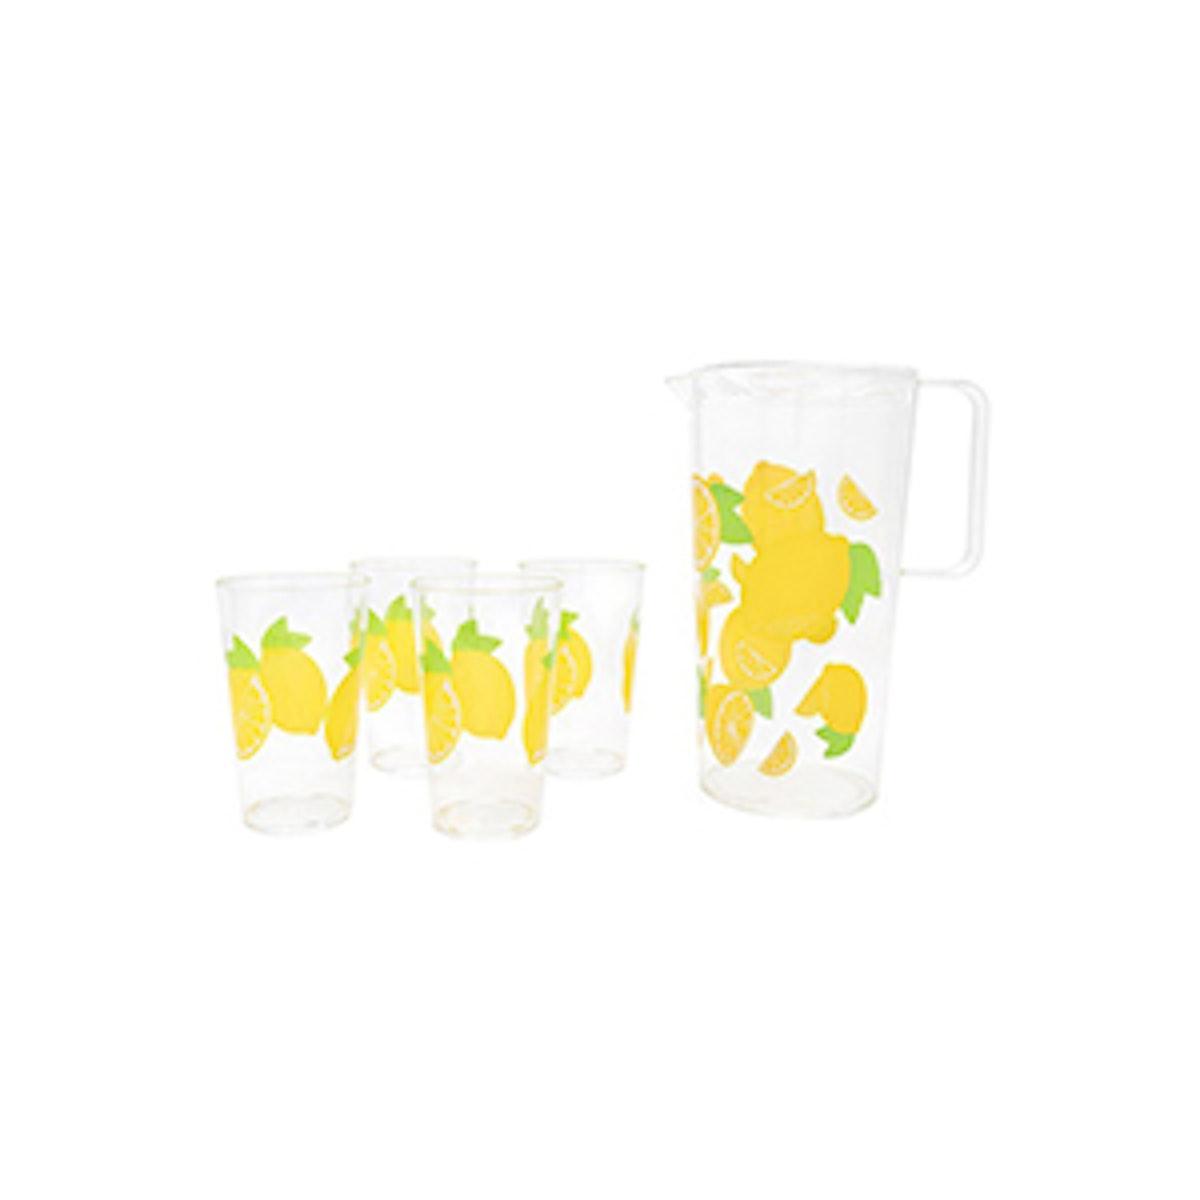 Party Drinkware Set- Lemon